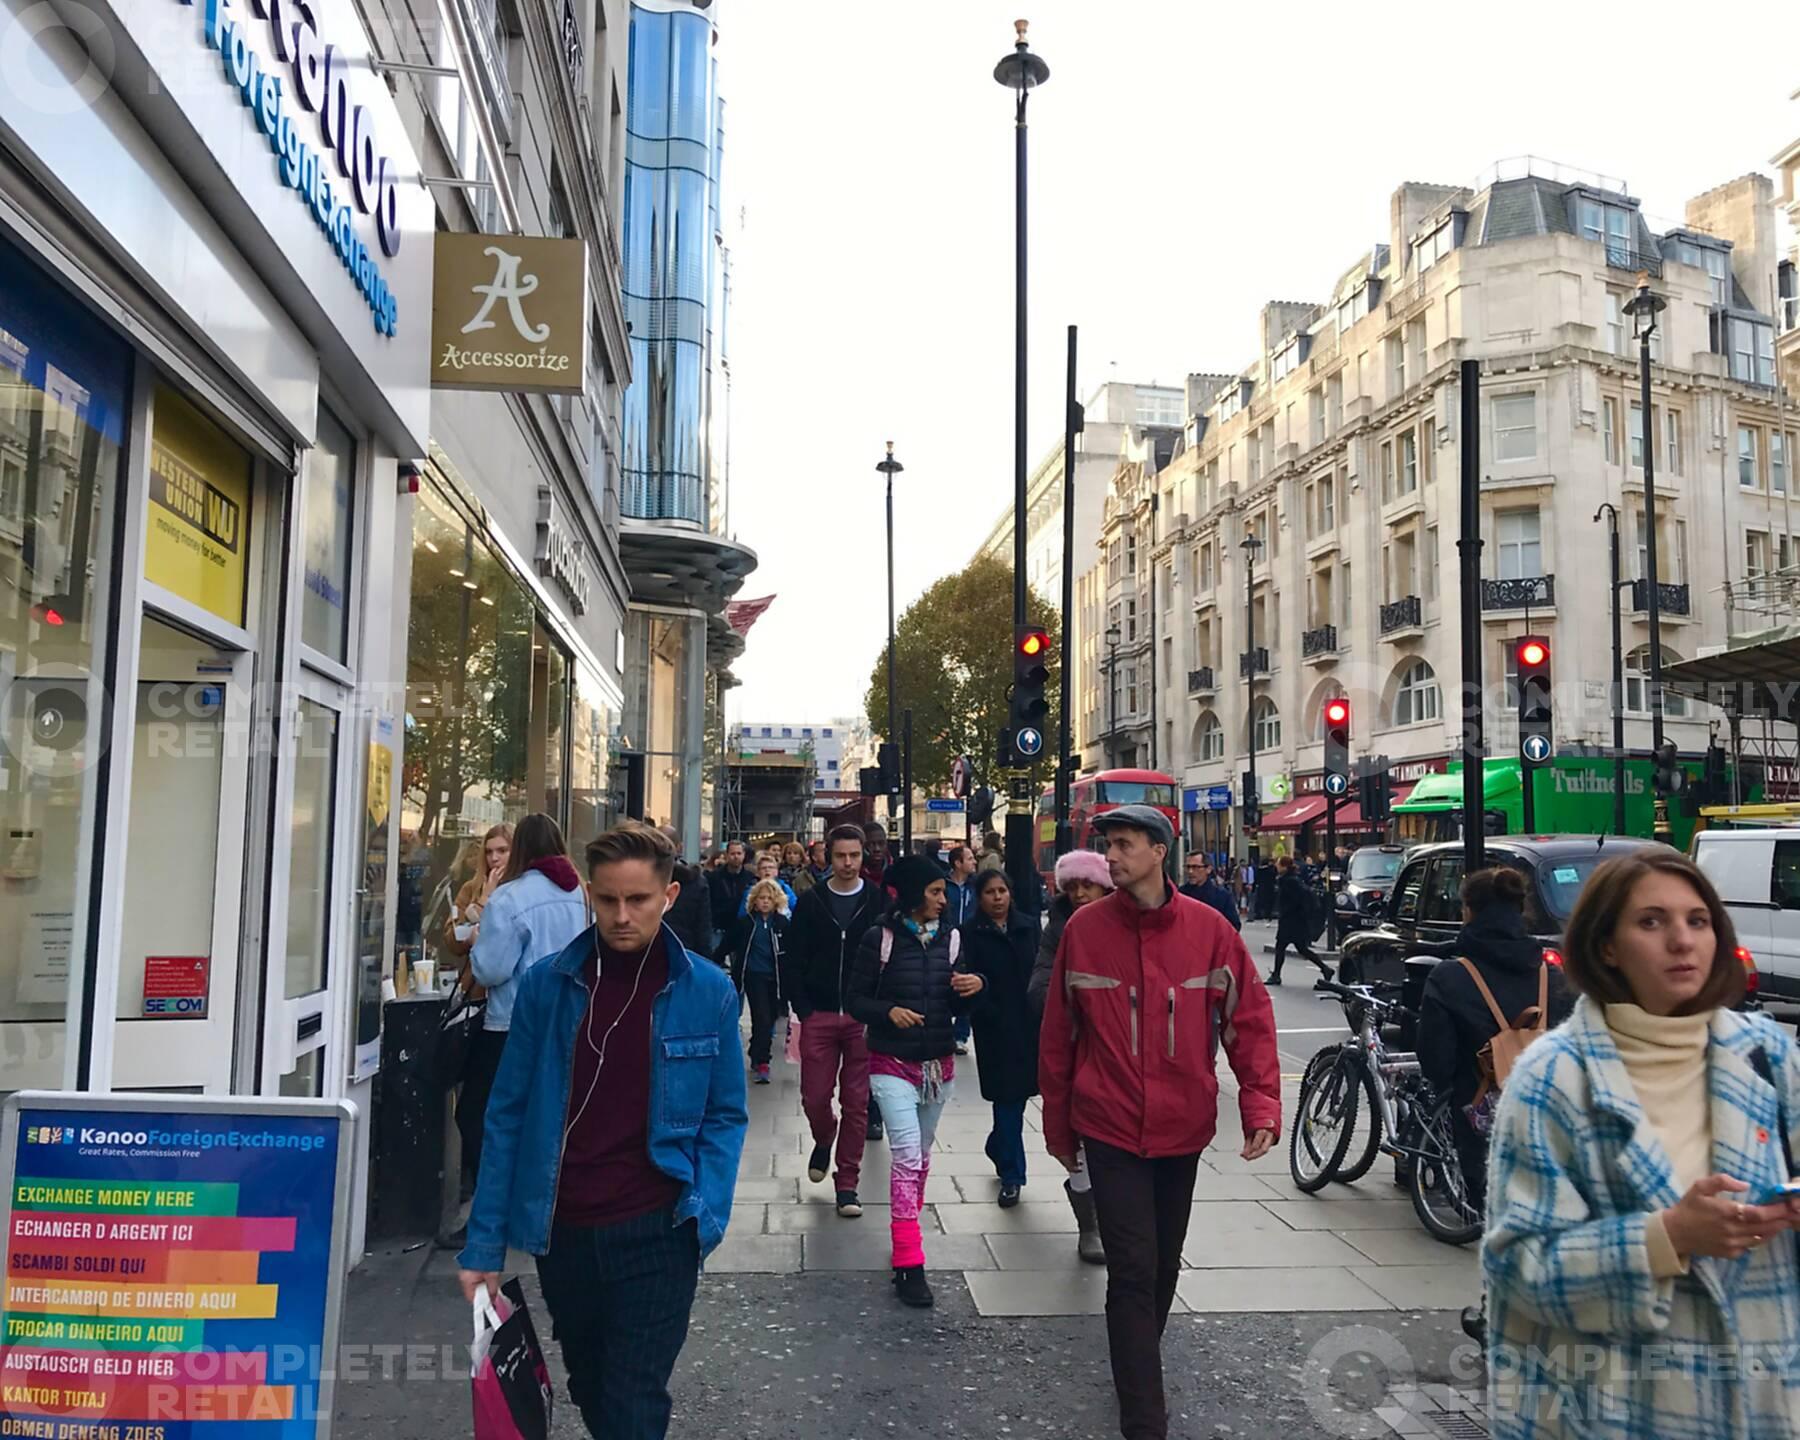 53 Oxford Street